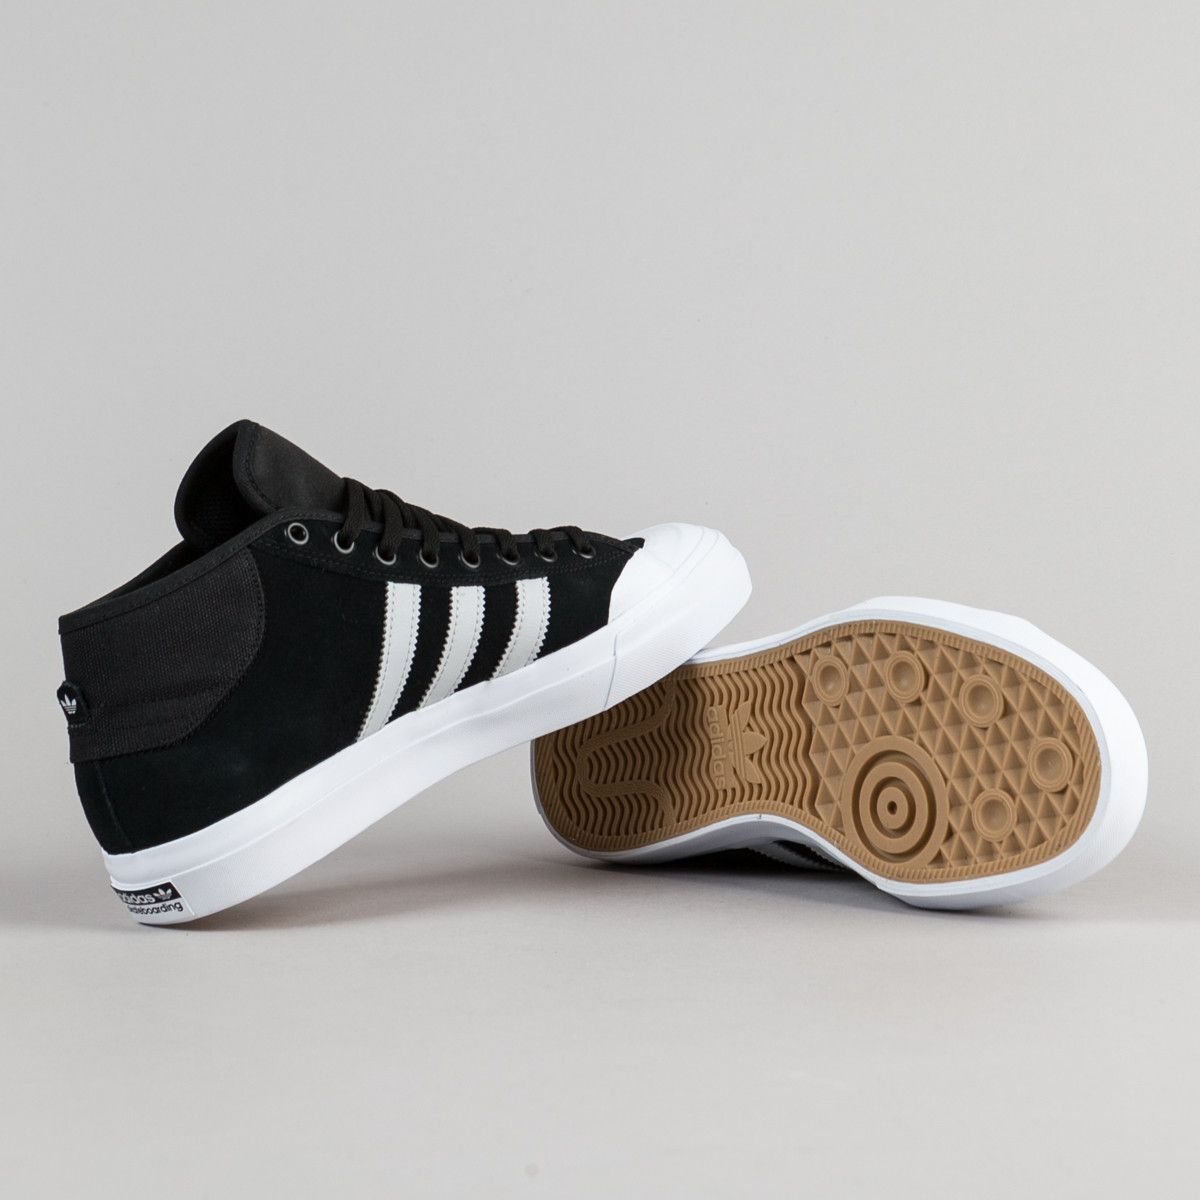 Adidas Matchcourt Mid ADV Shoes - Core Black   Grey   White ... c76a5ead2